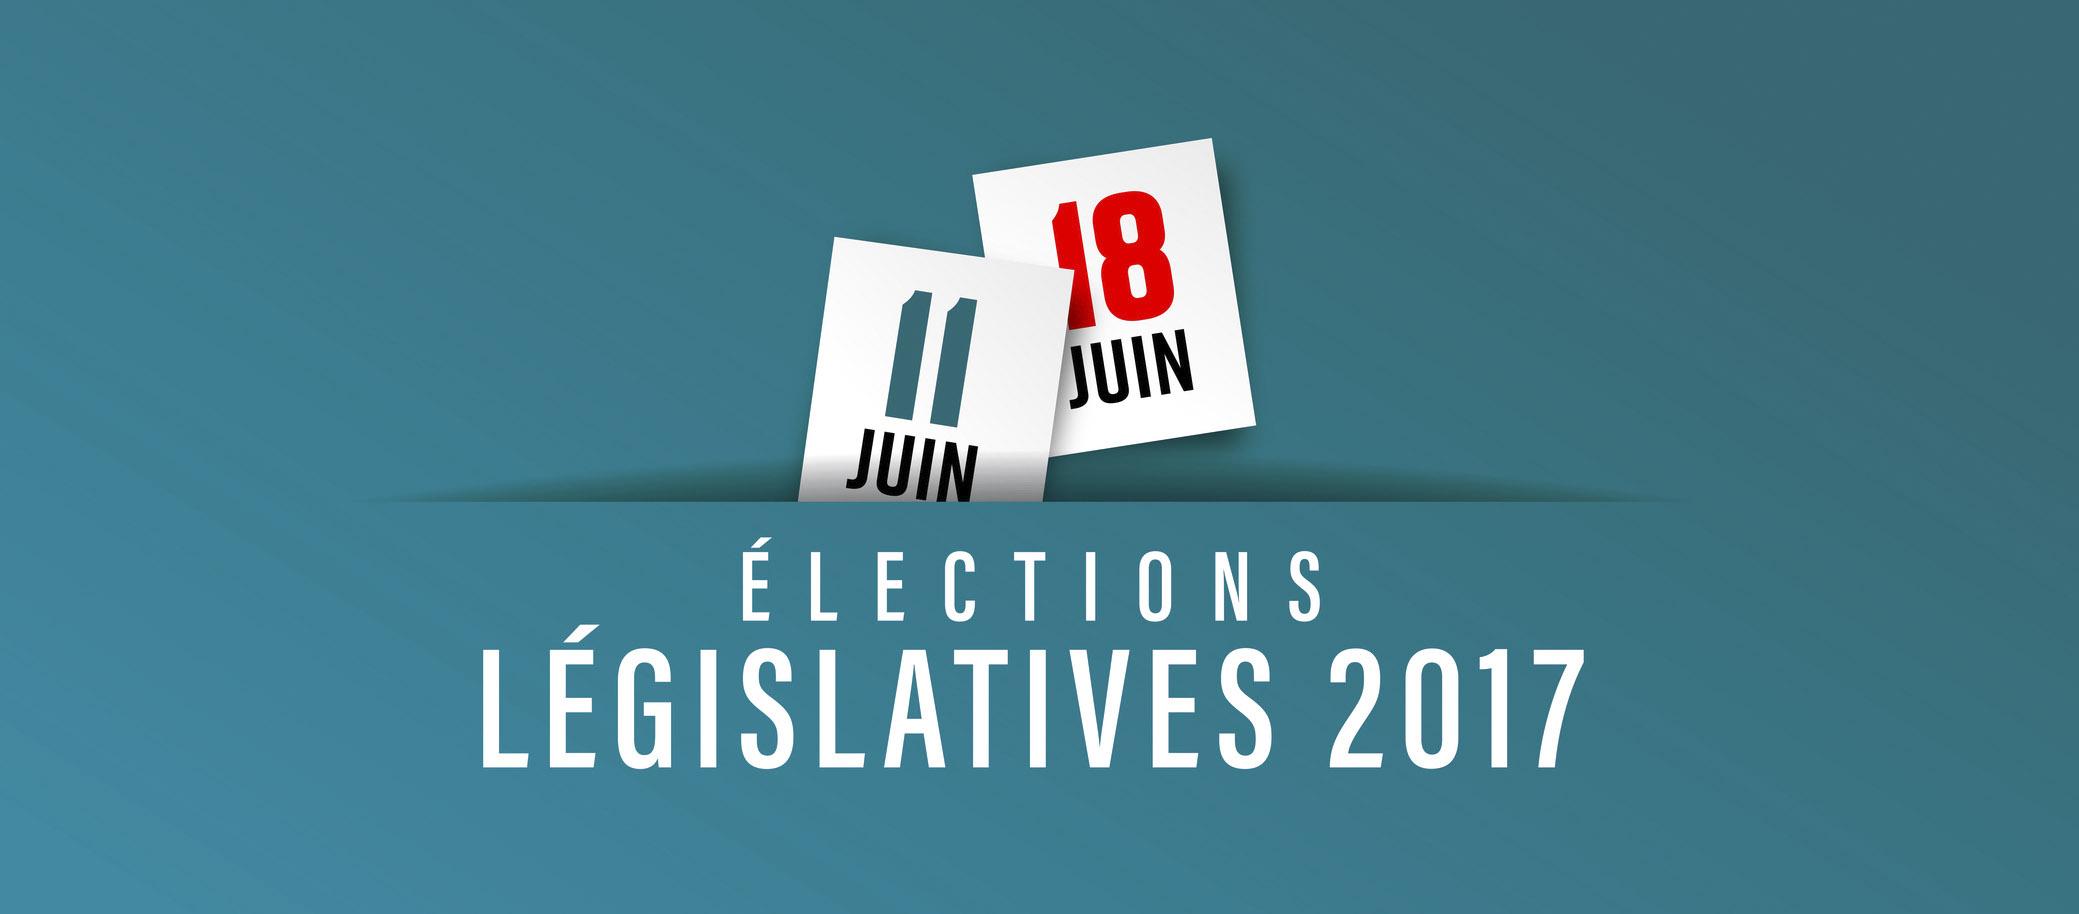 Legislatives upr